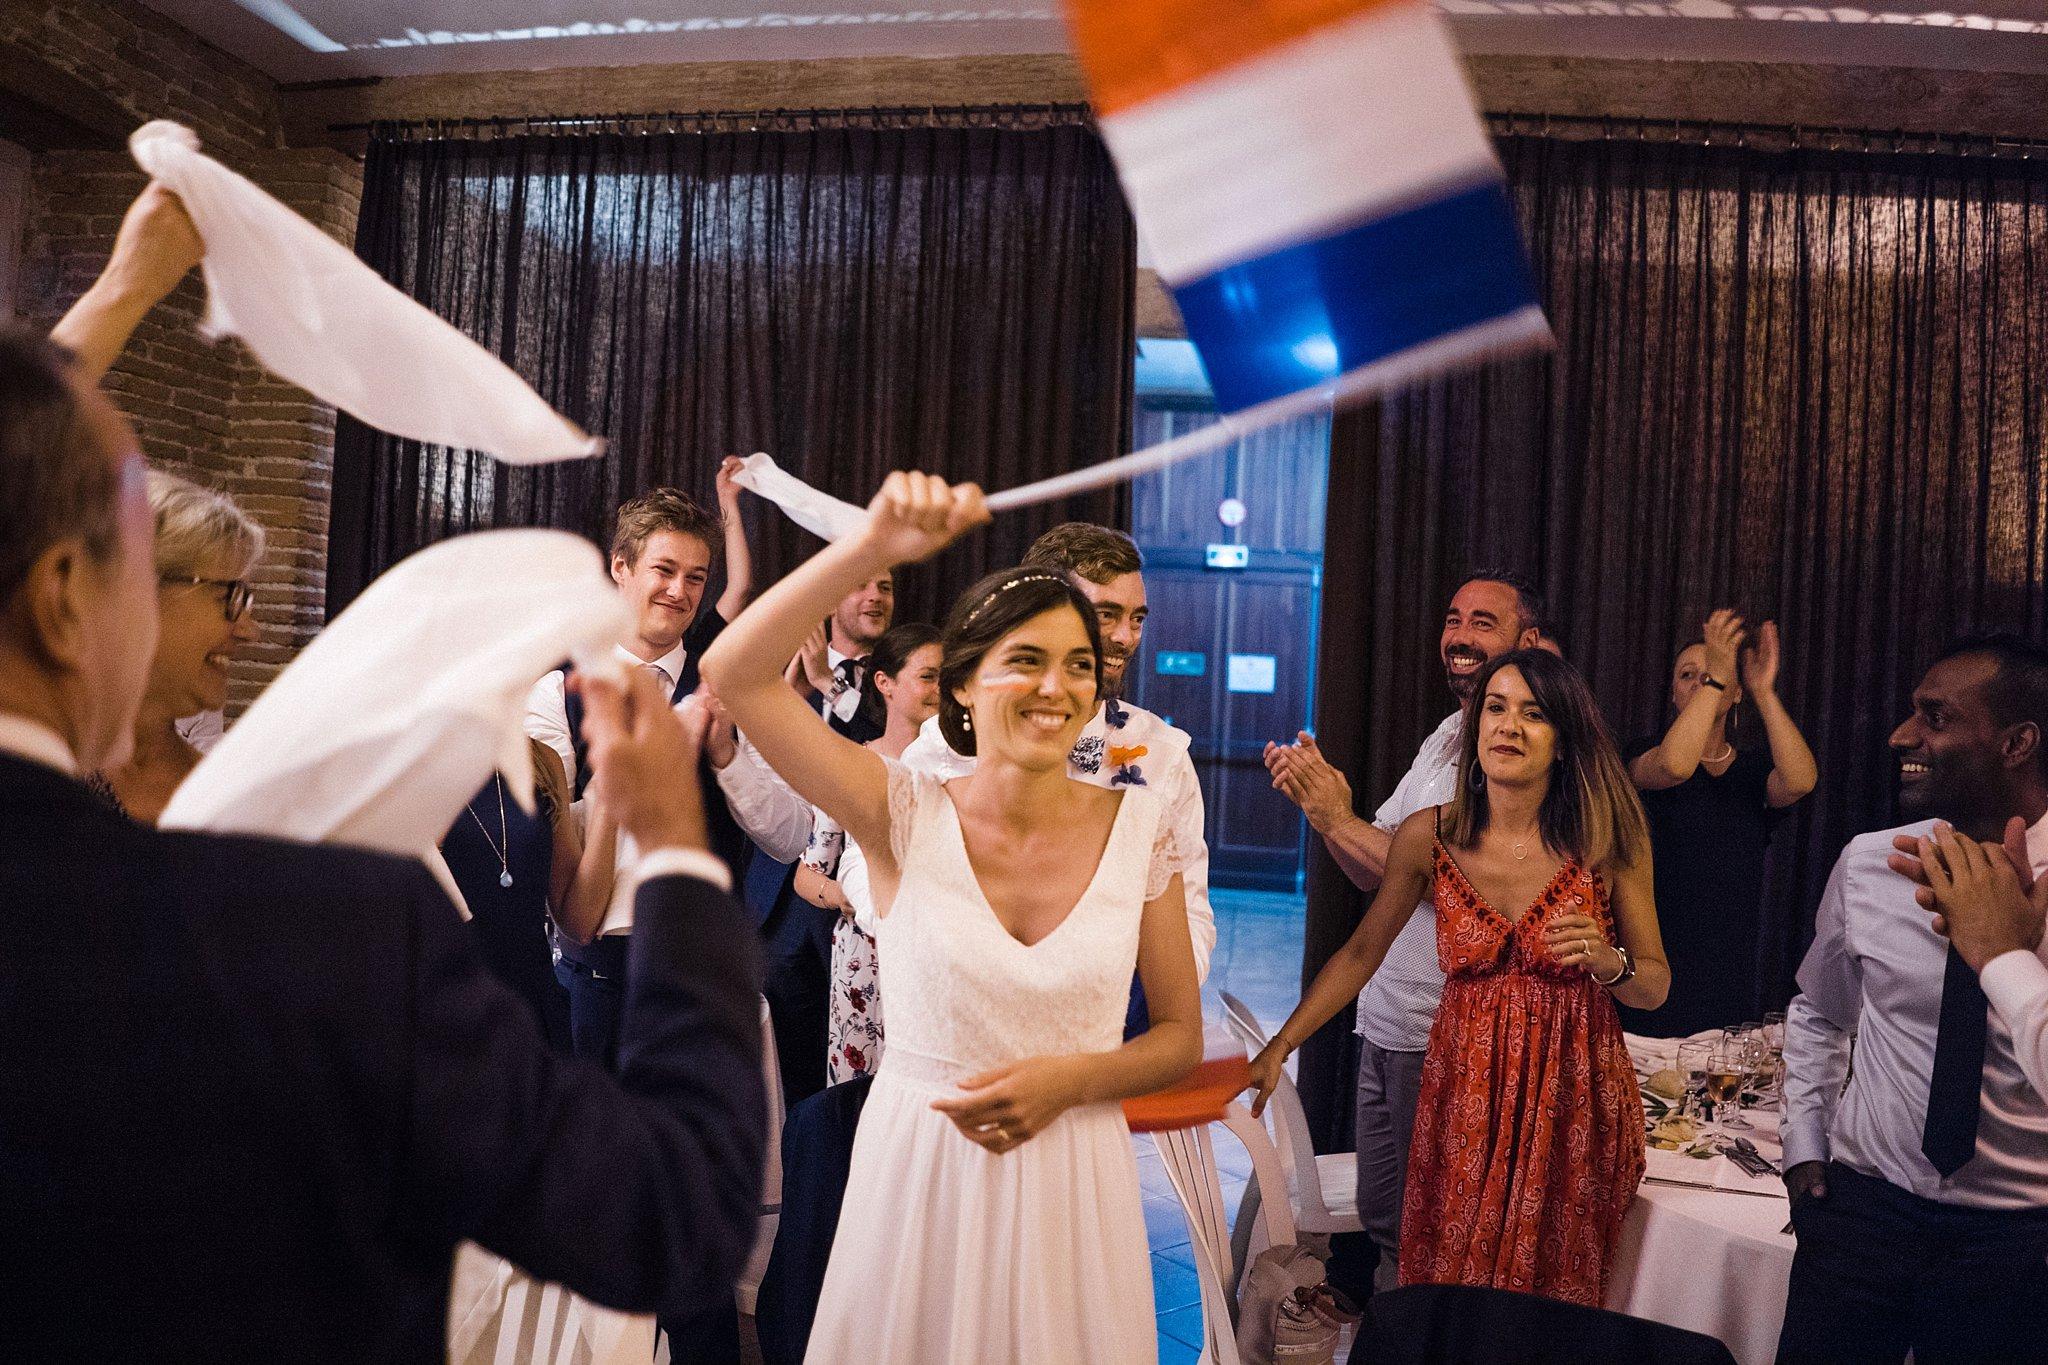 Mariage-a-la-maison-secall-hugo-hennequin-photographe-mariage-perpignan_0102.jpg